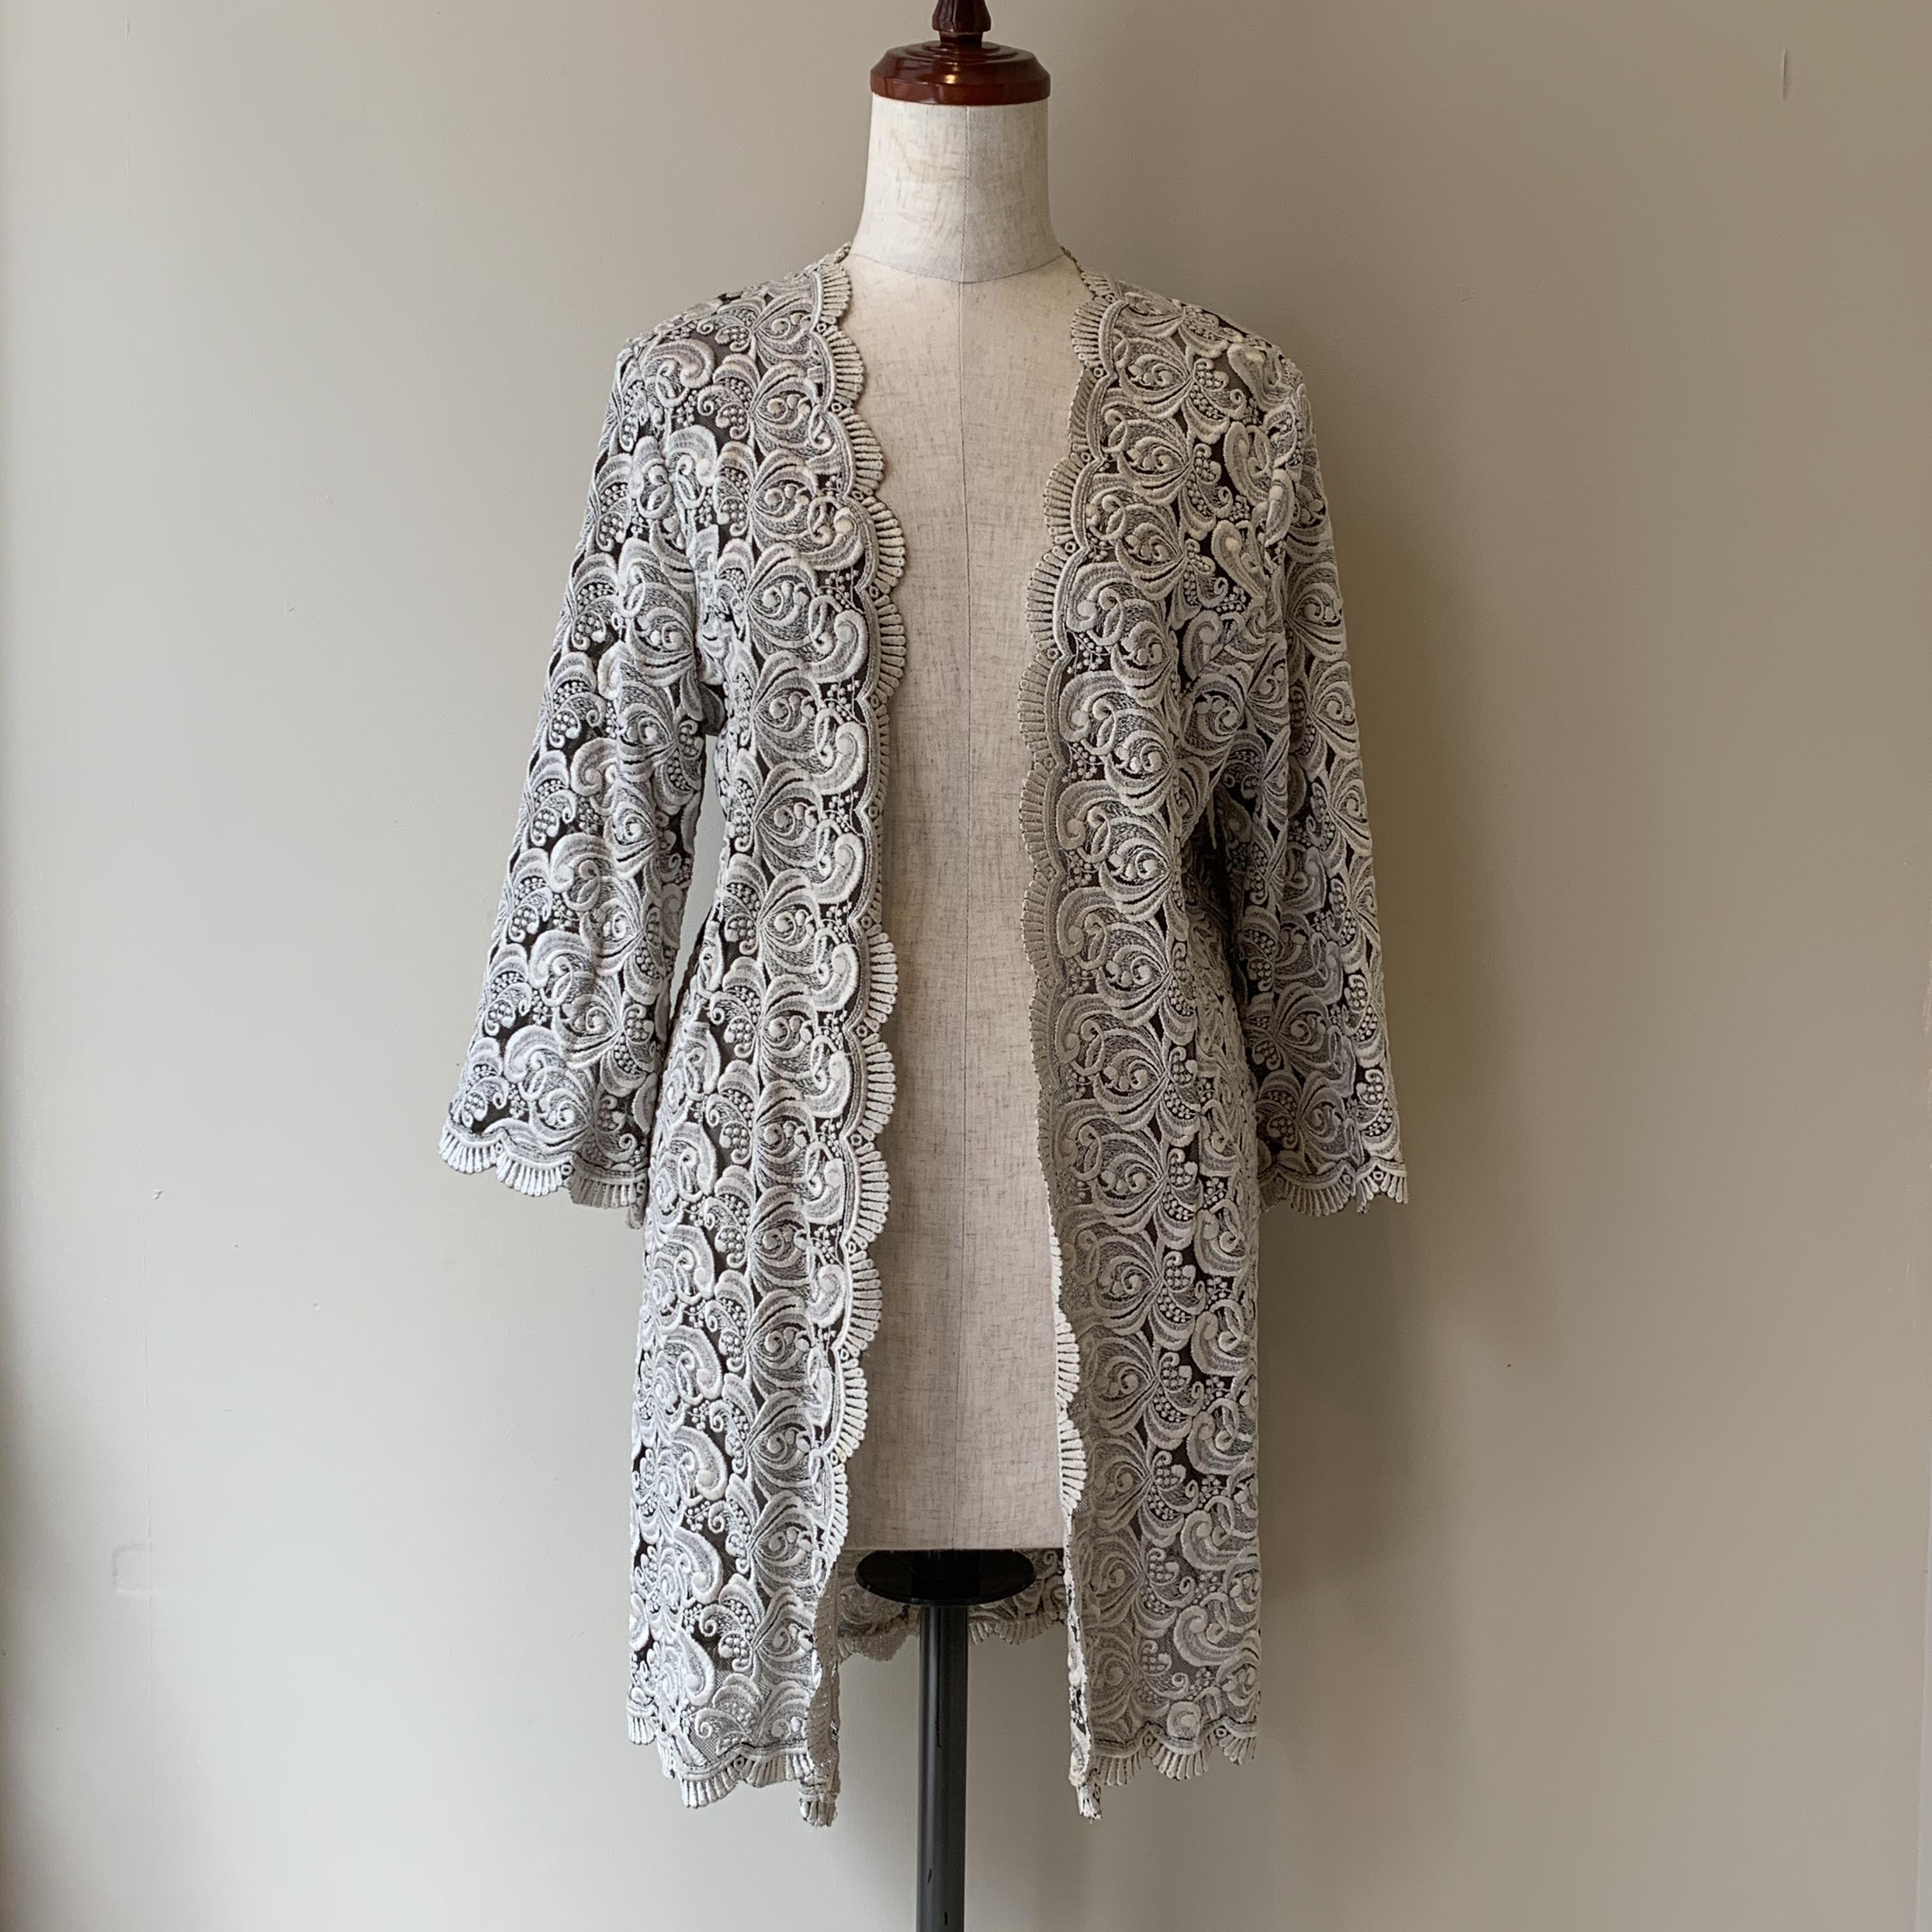 60s vintage lace haori